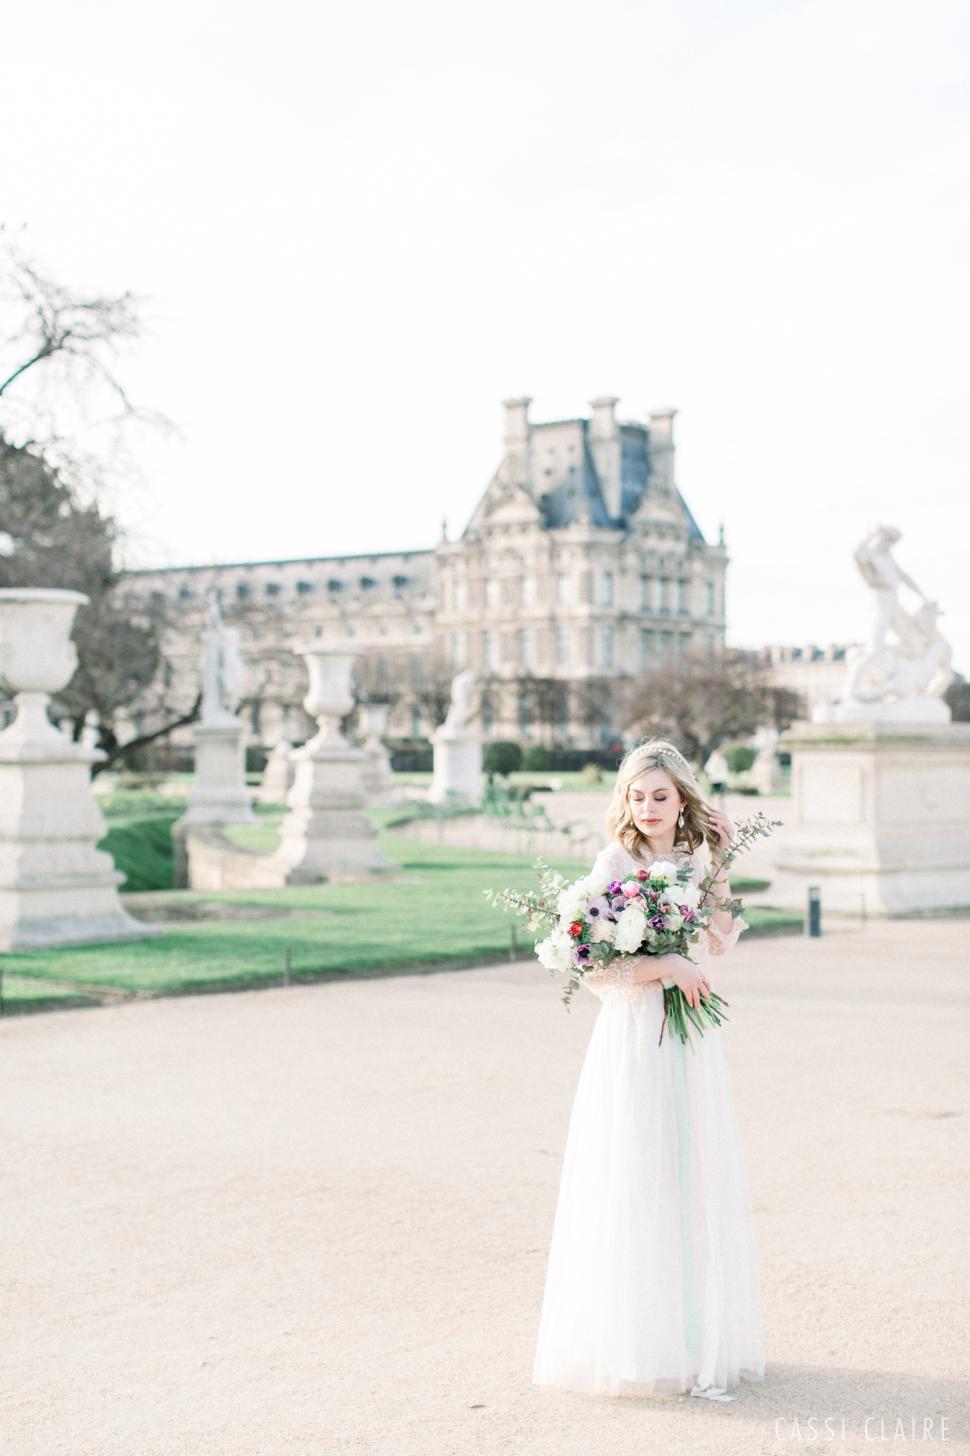 Paris-France-Wedding_CassiClaire_34.jpg